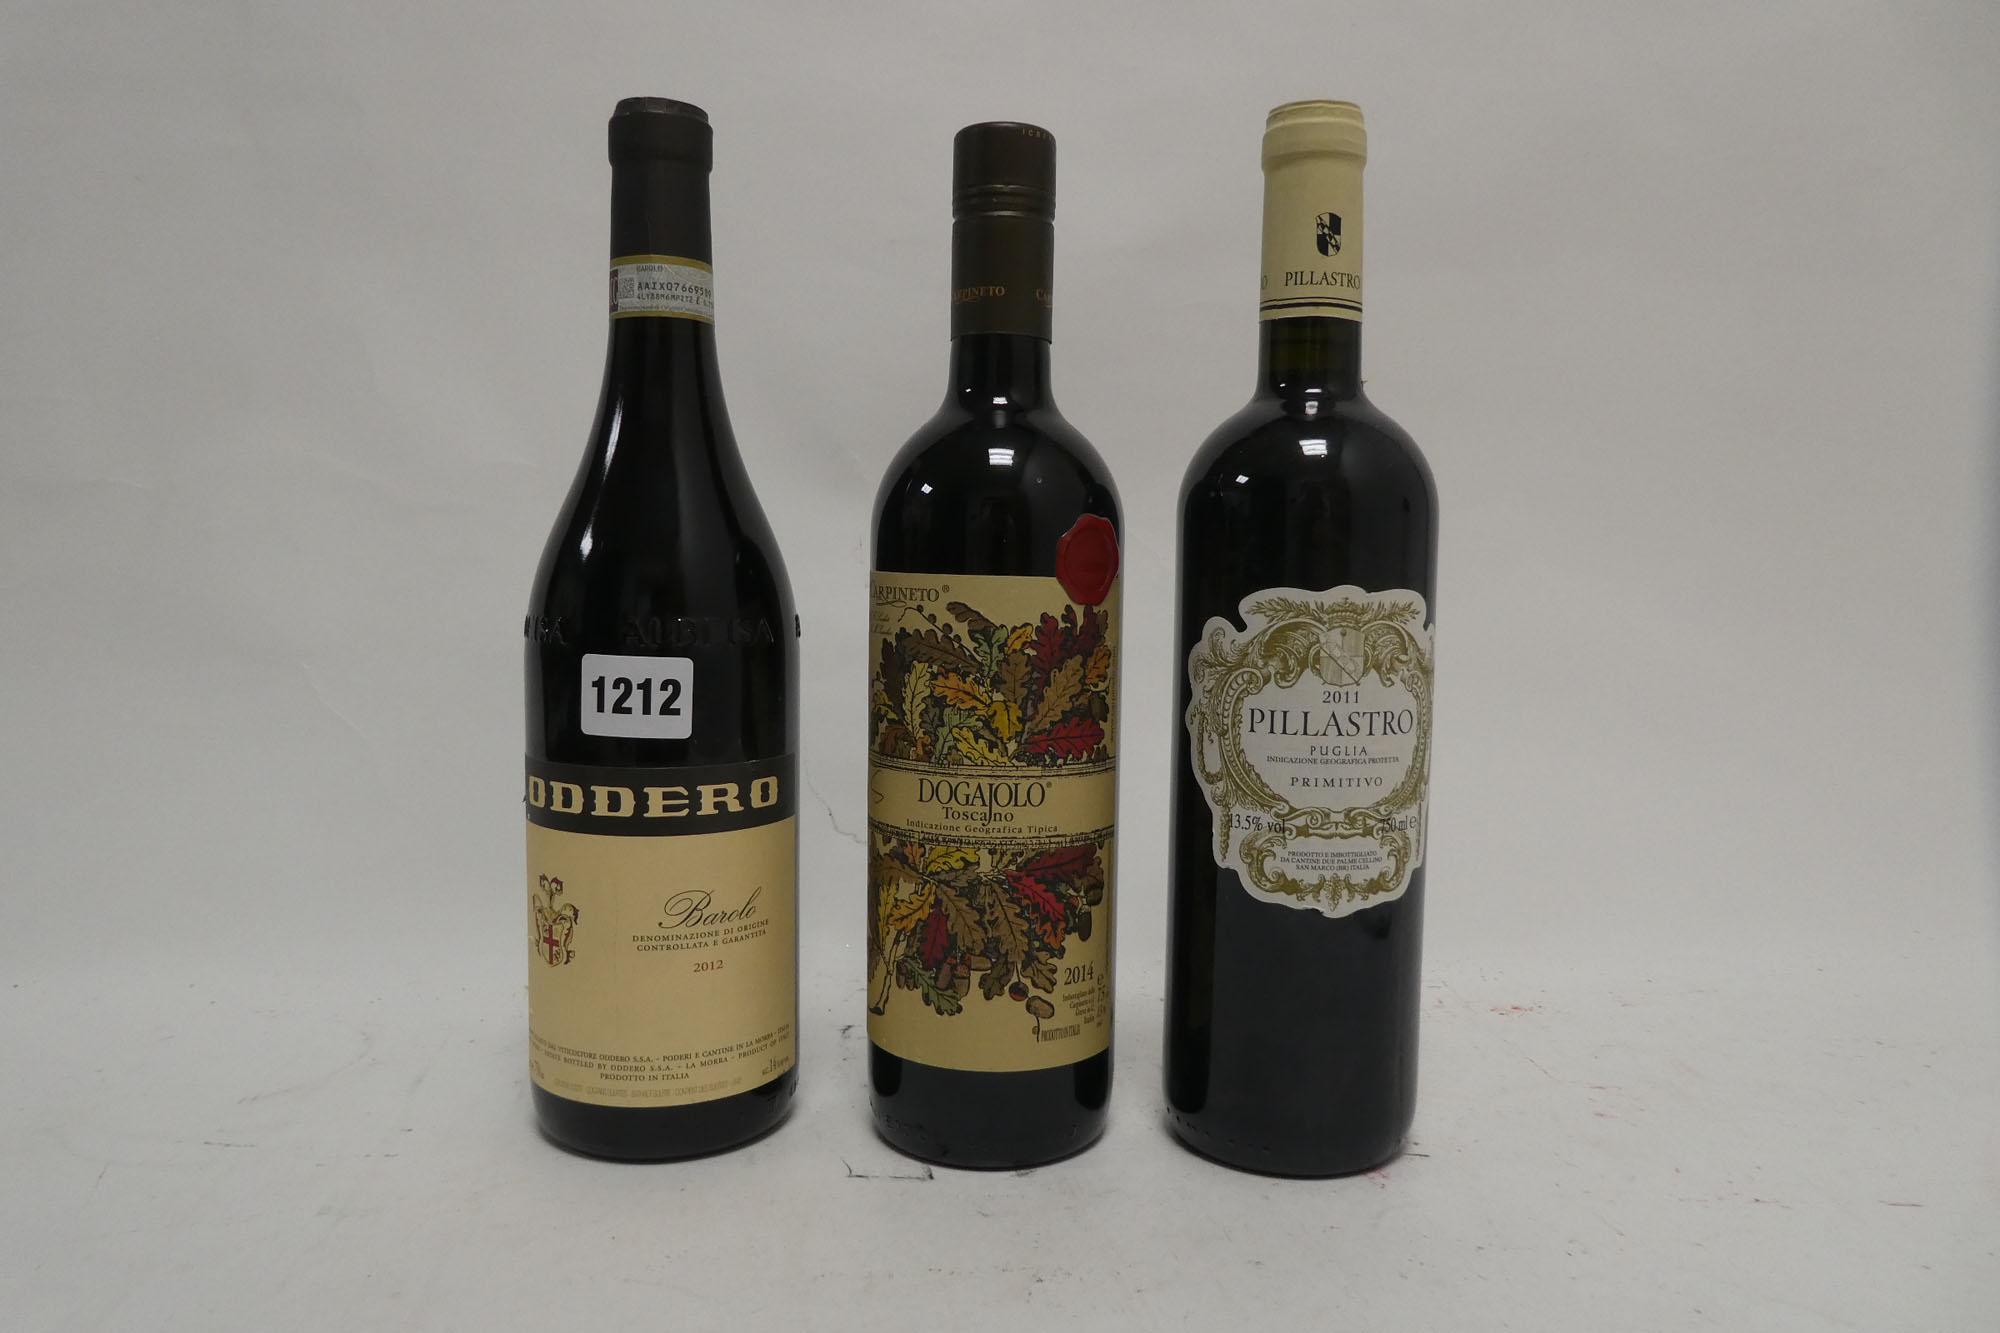 3 bottles, 1x Oddero 2012 Barolo DOCG,